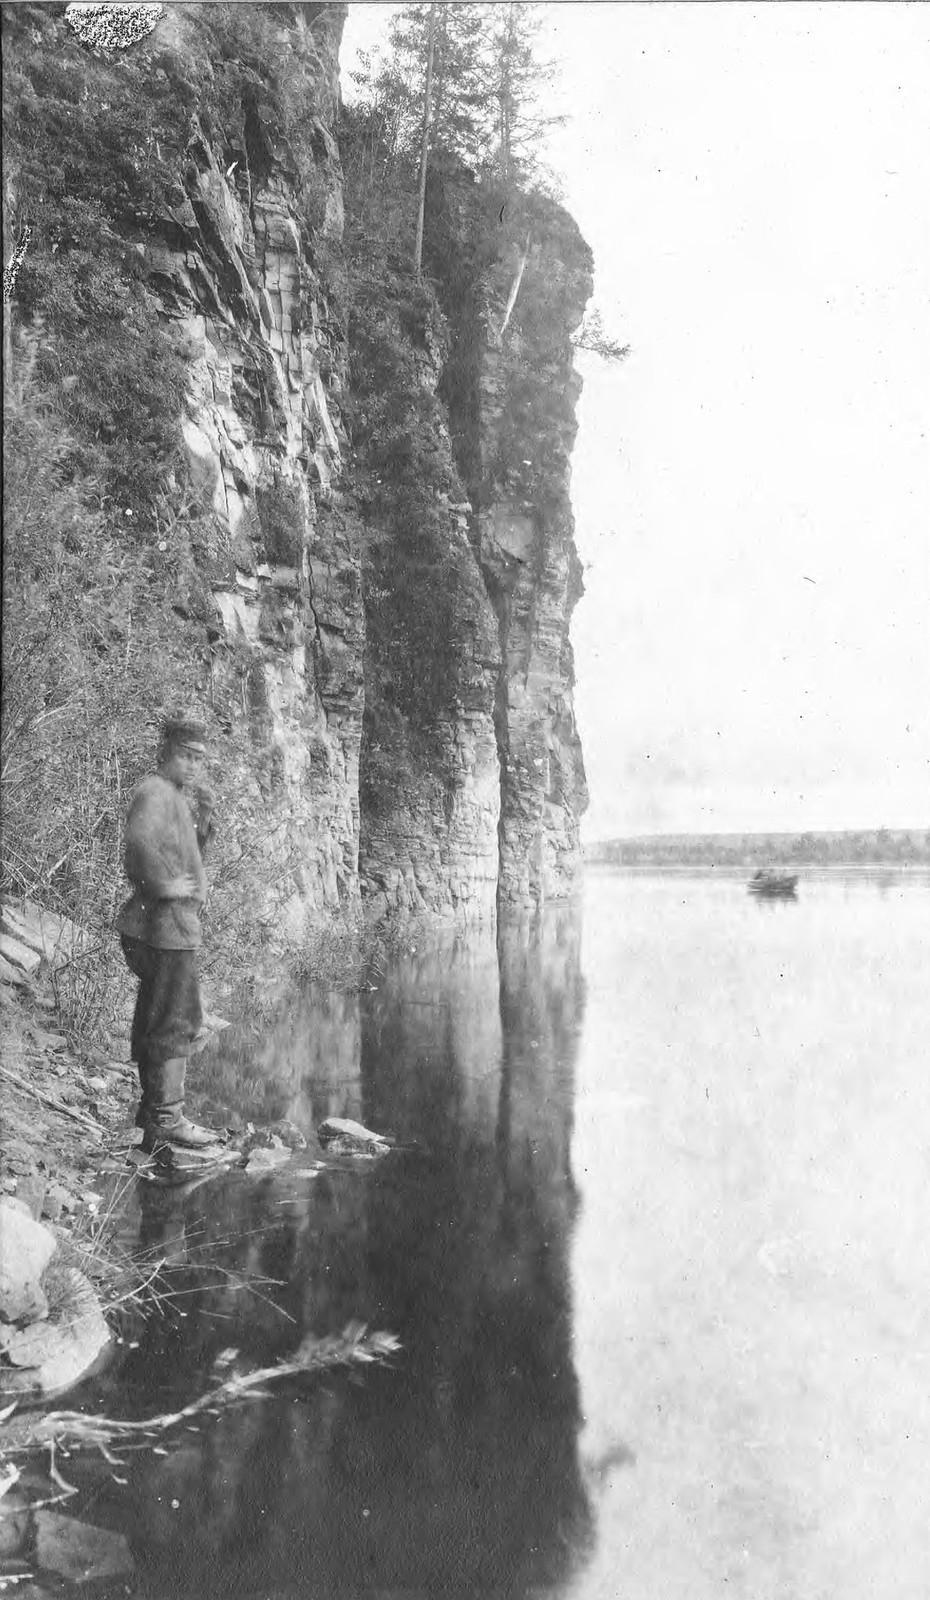 Вид участка обрывистого правого берега реки Зеи